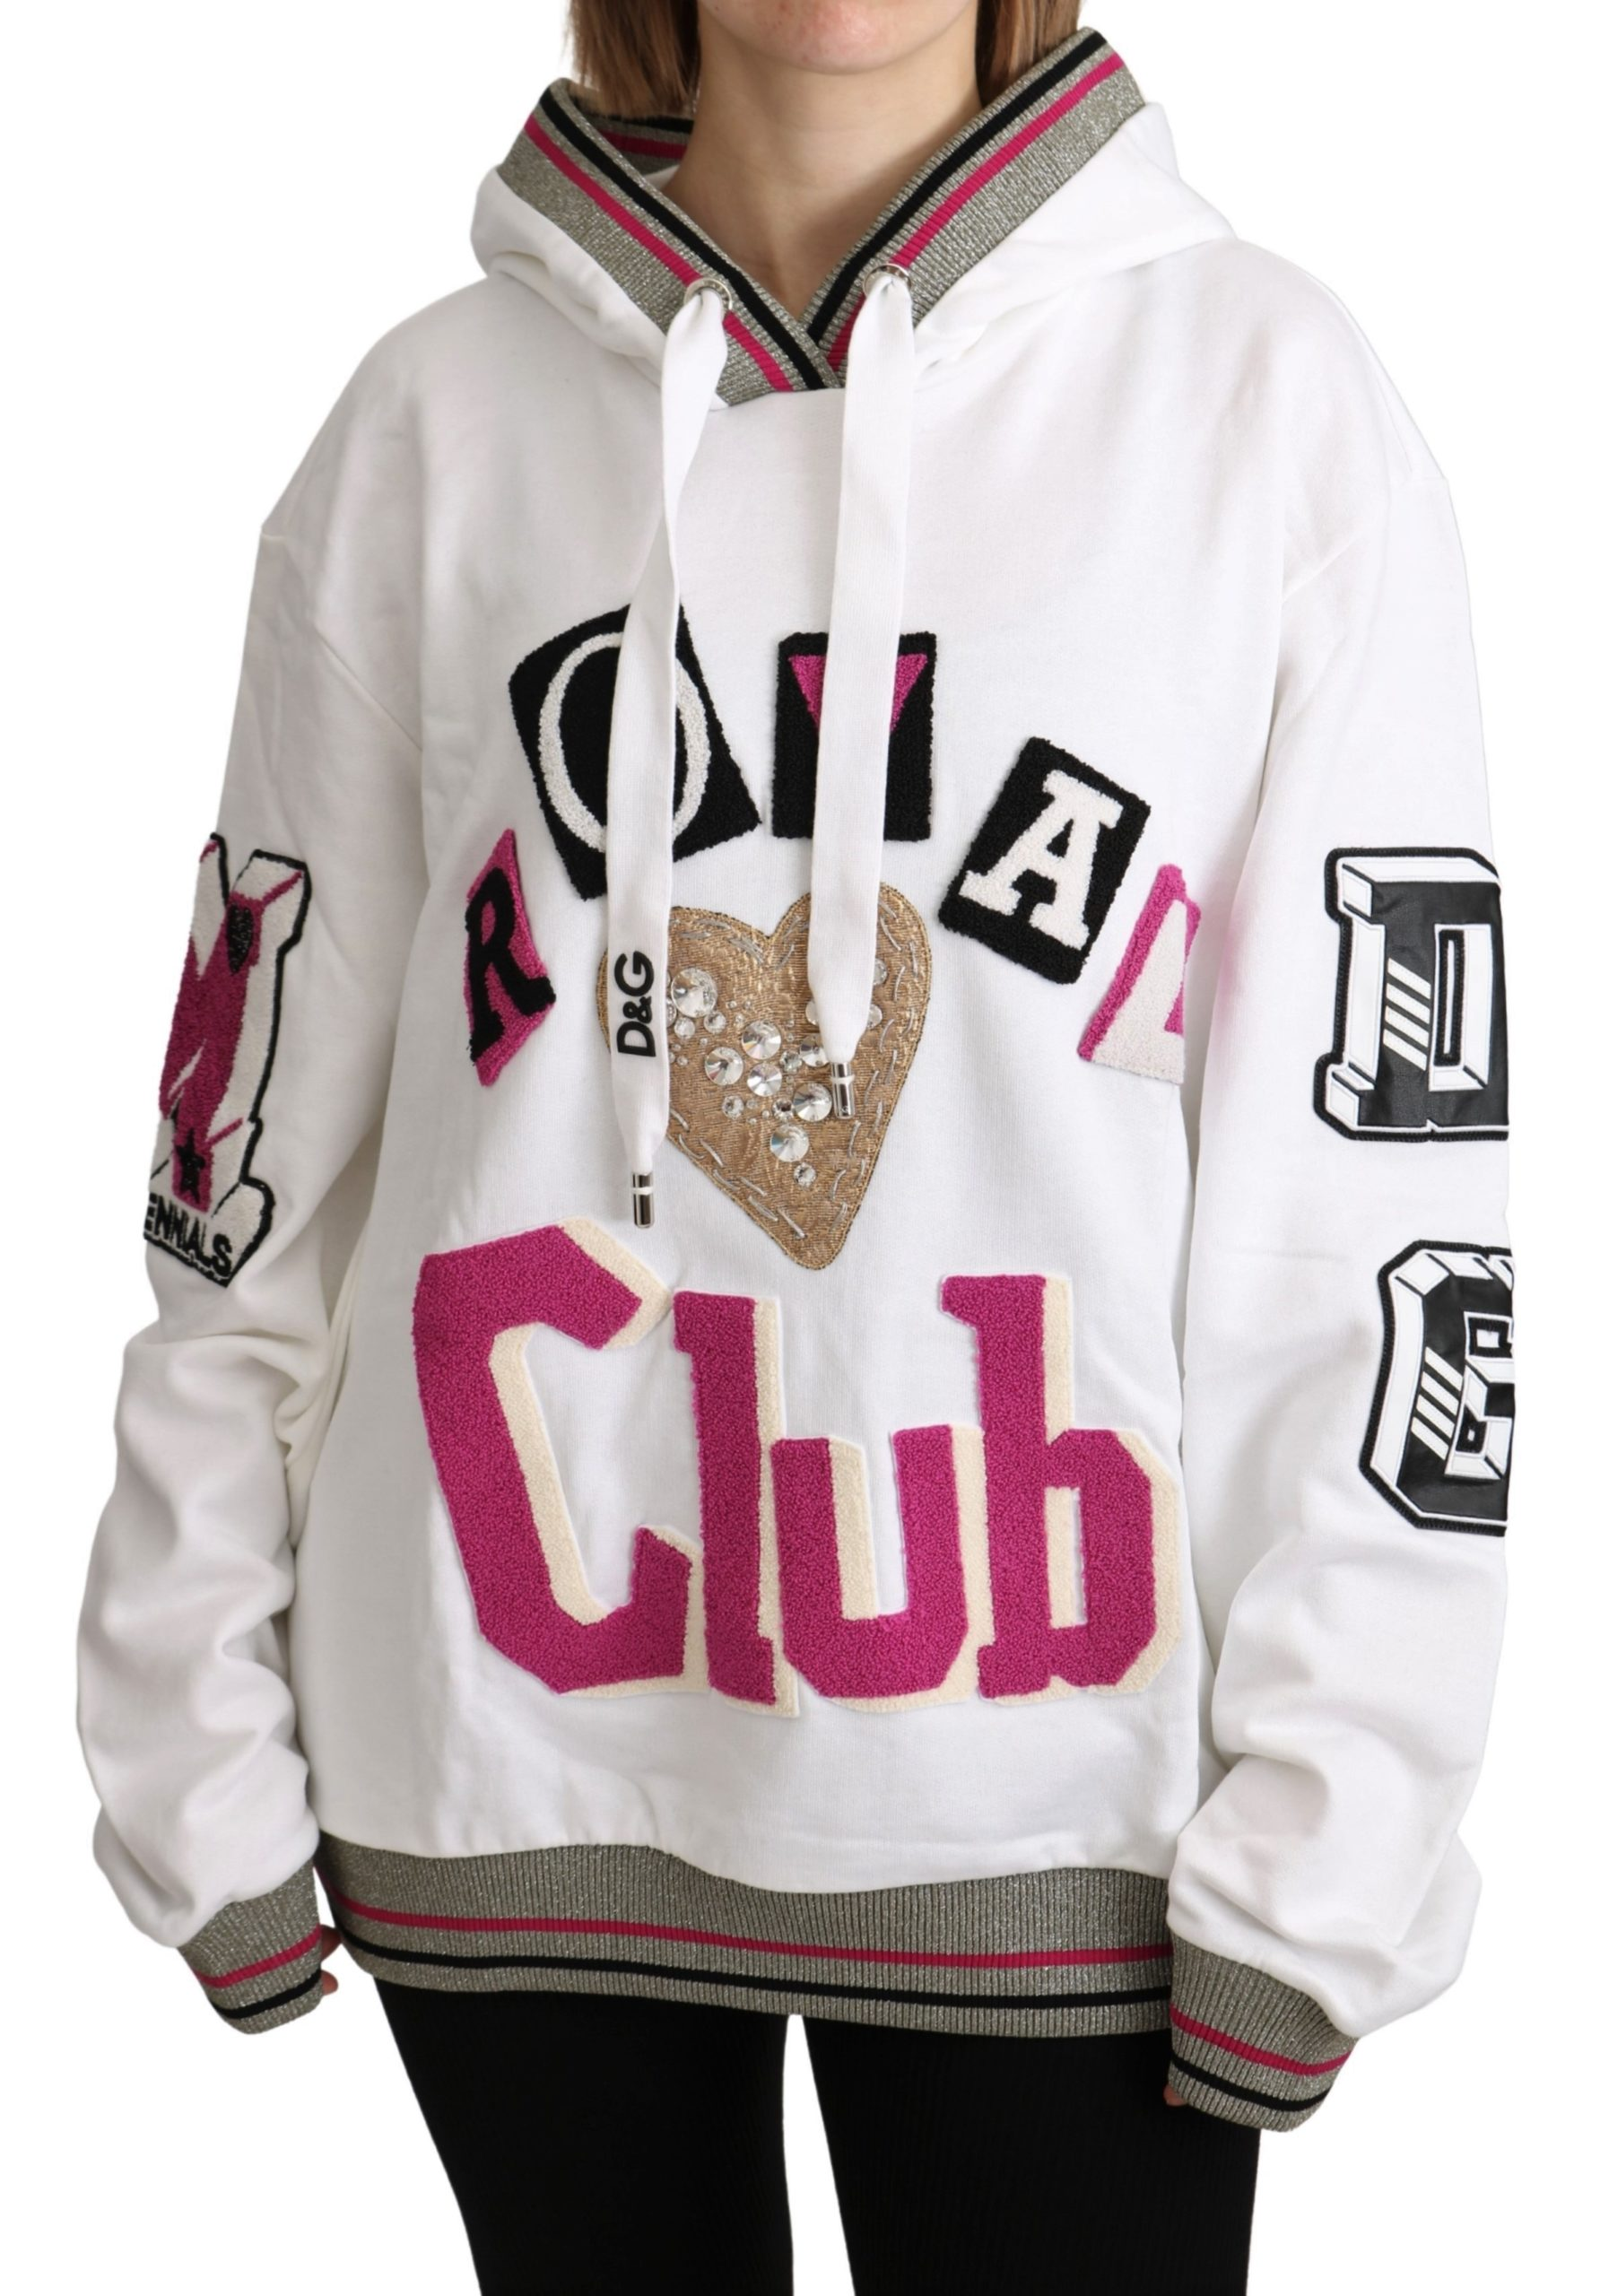 Dolce & Gabbana Women's Royal Club Hooded Crystal Sweater White TSH5181 - IT44 L